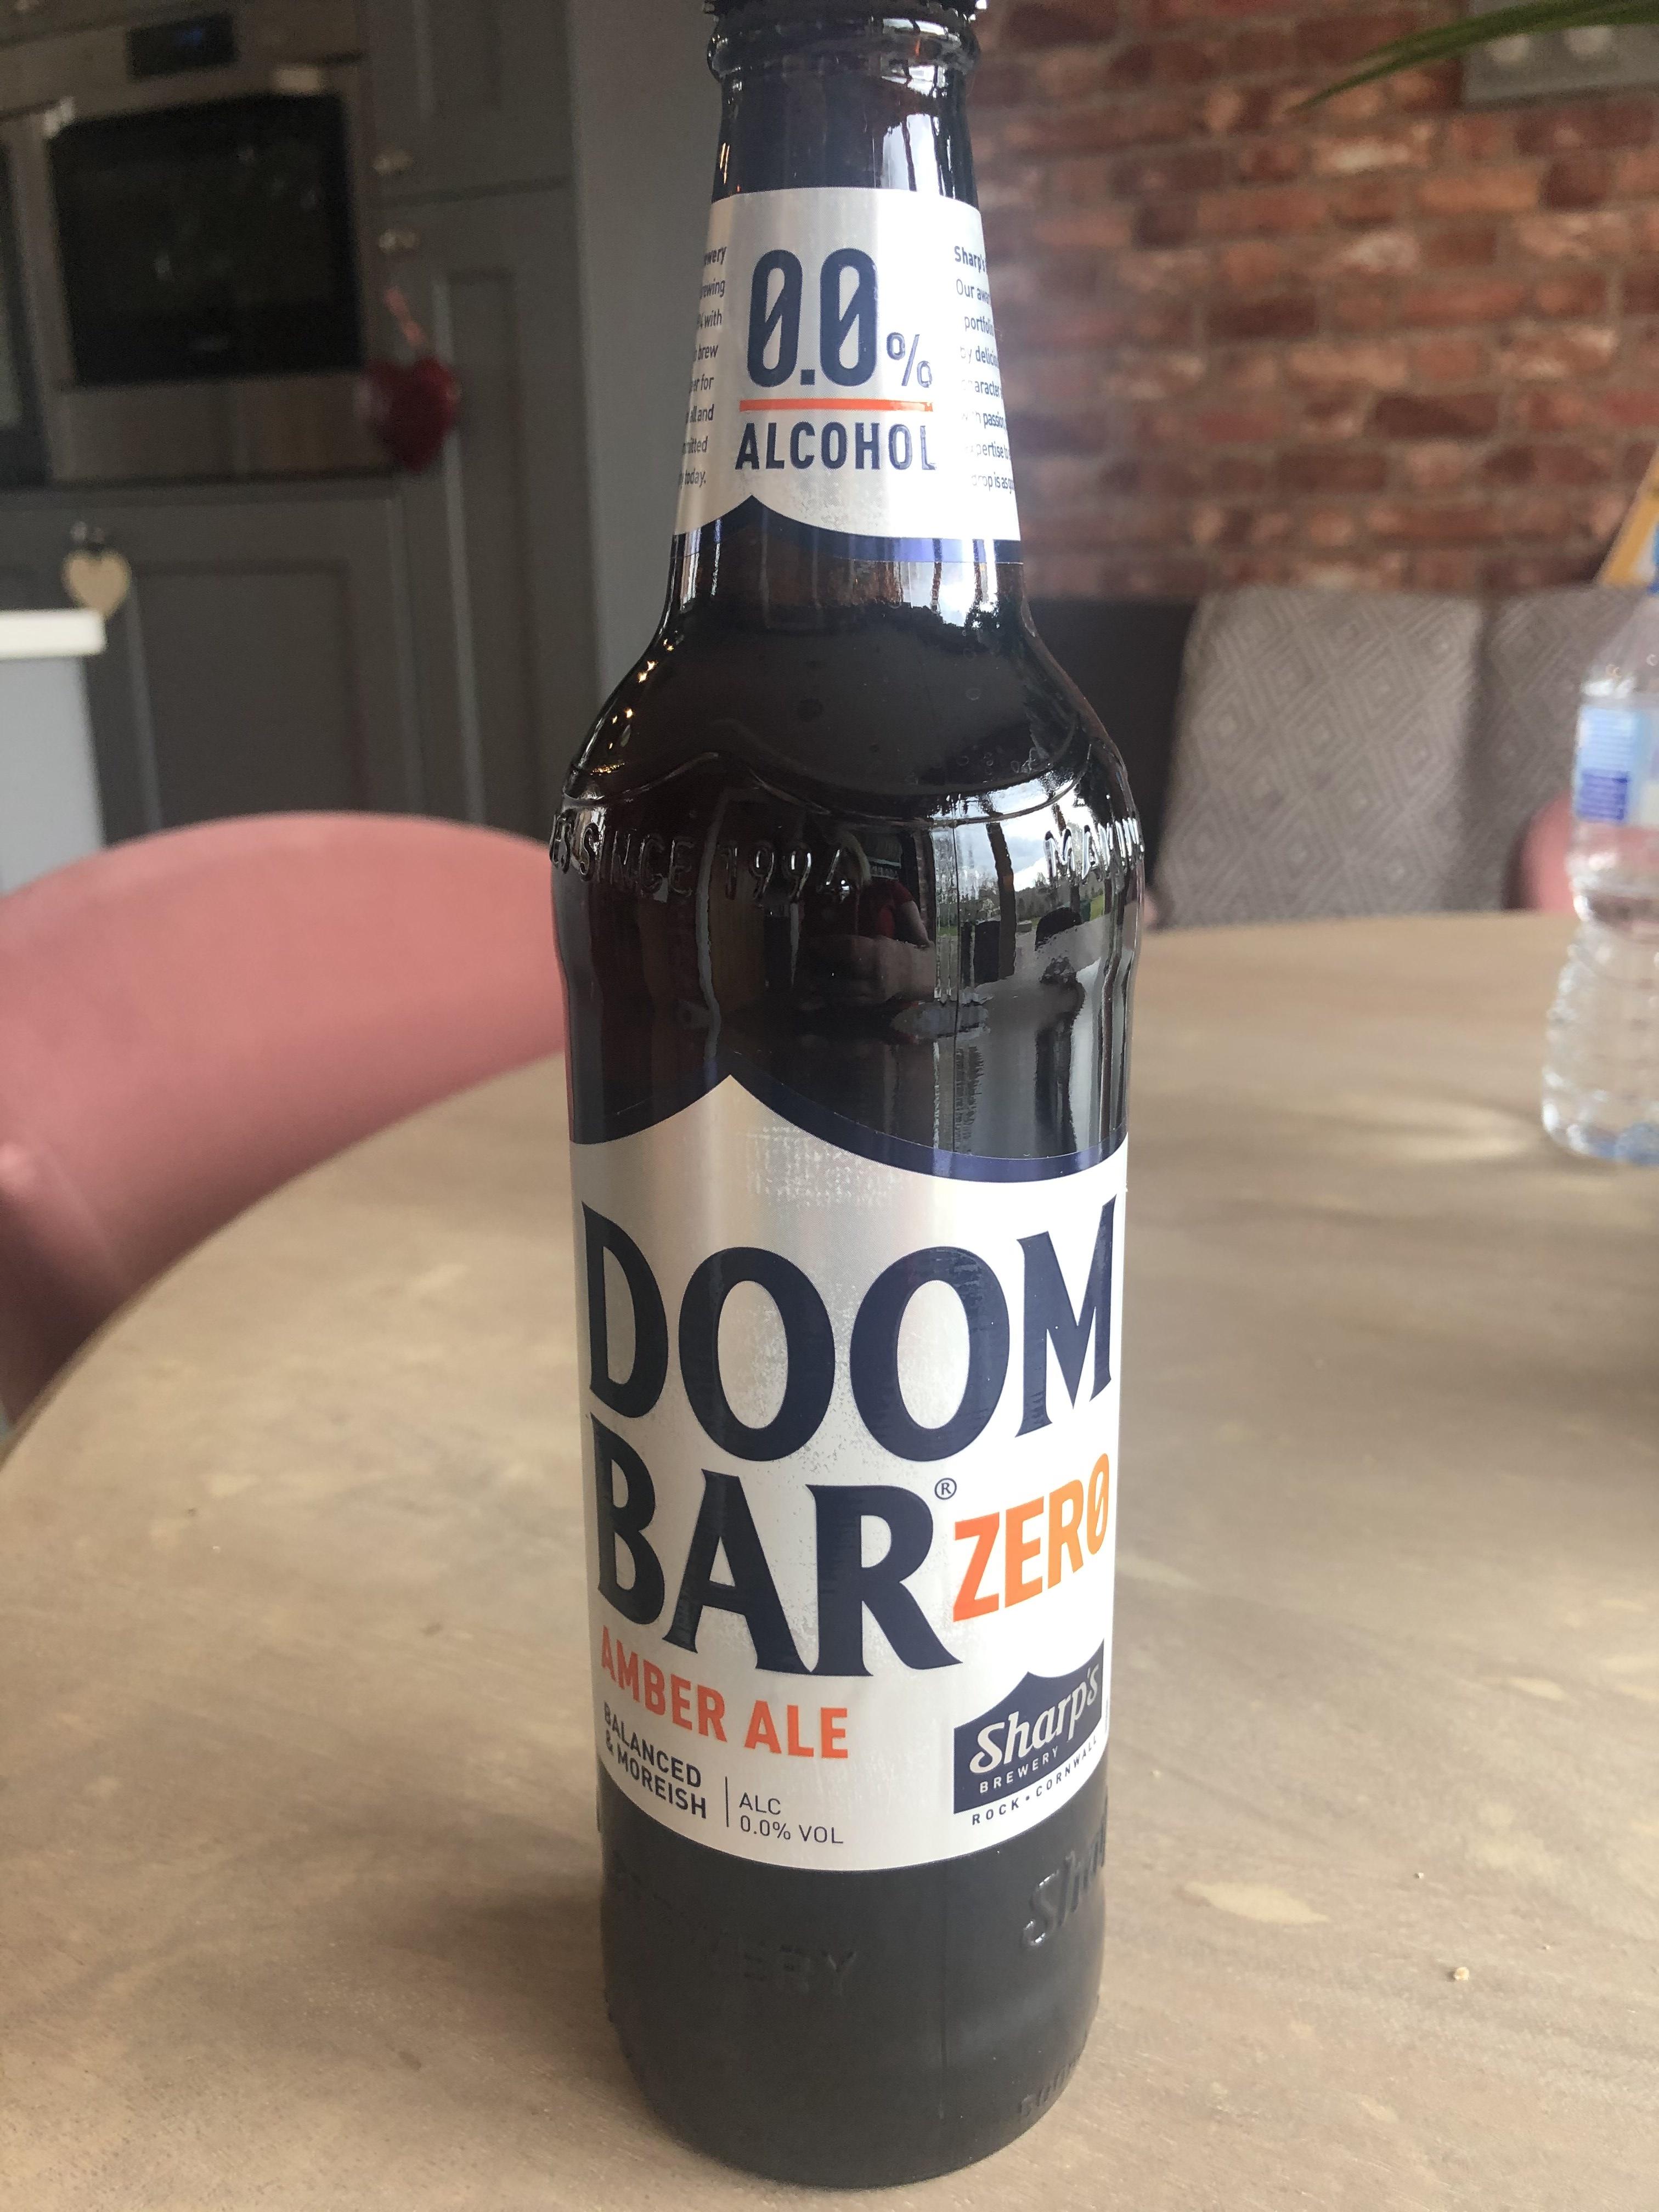 Sharps Doom Bar Zero 39p at Selby Home Bargains